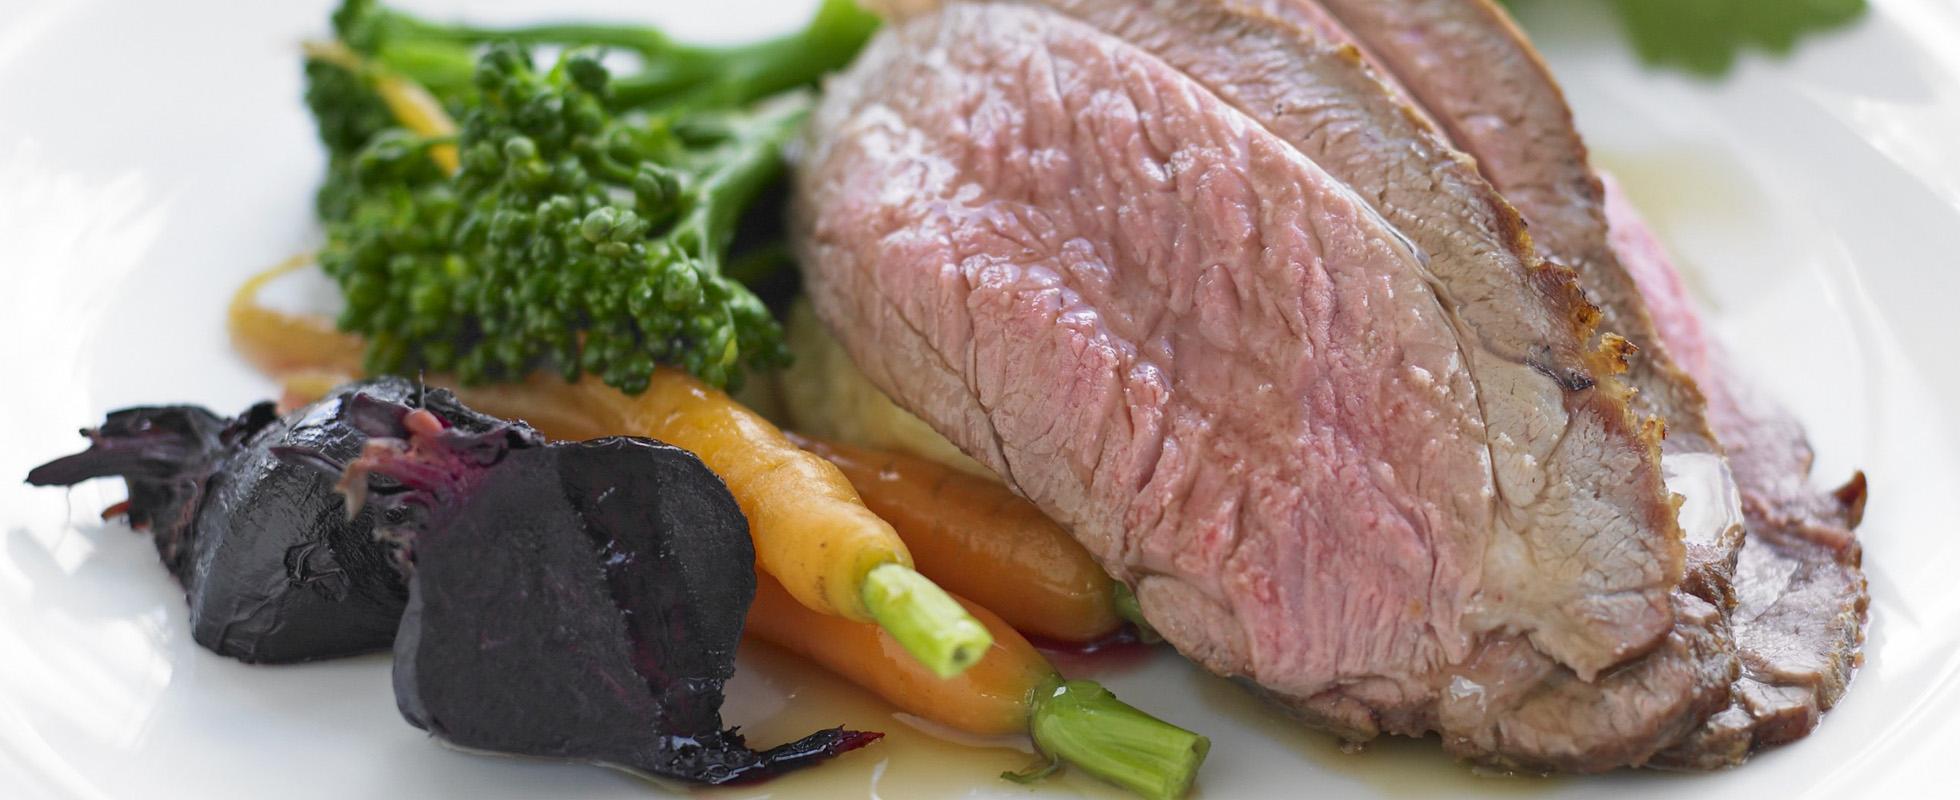 Lamb rump with seasonal vegetables